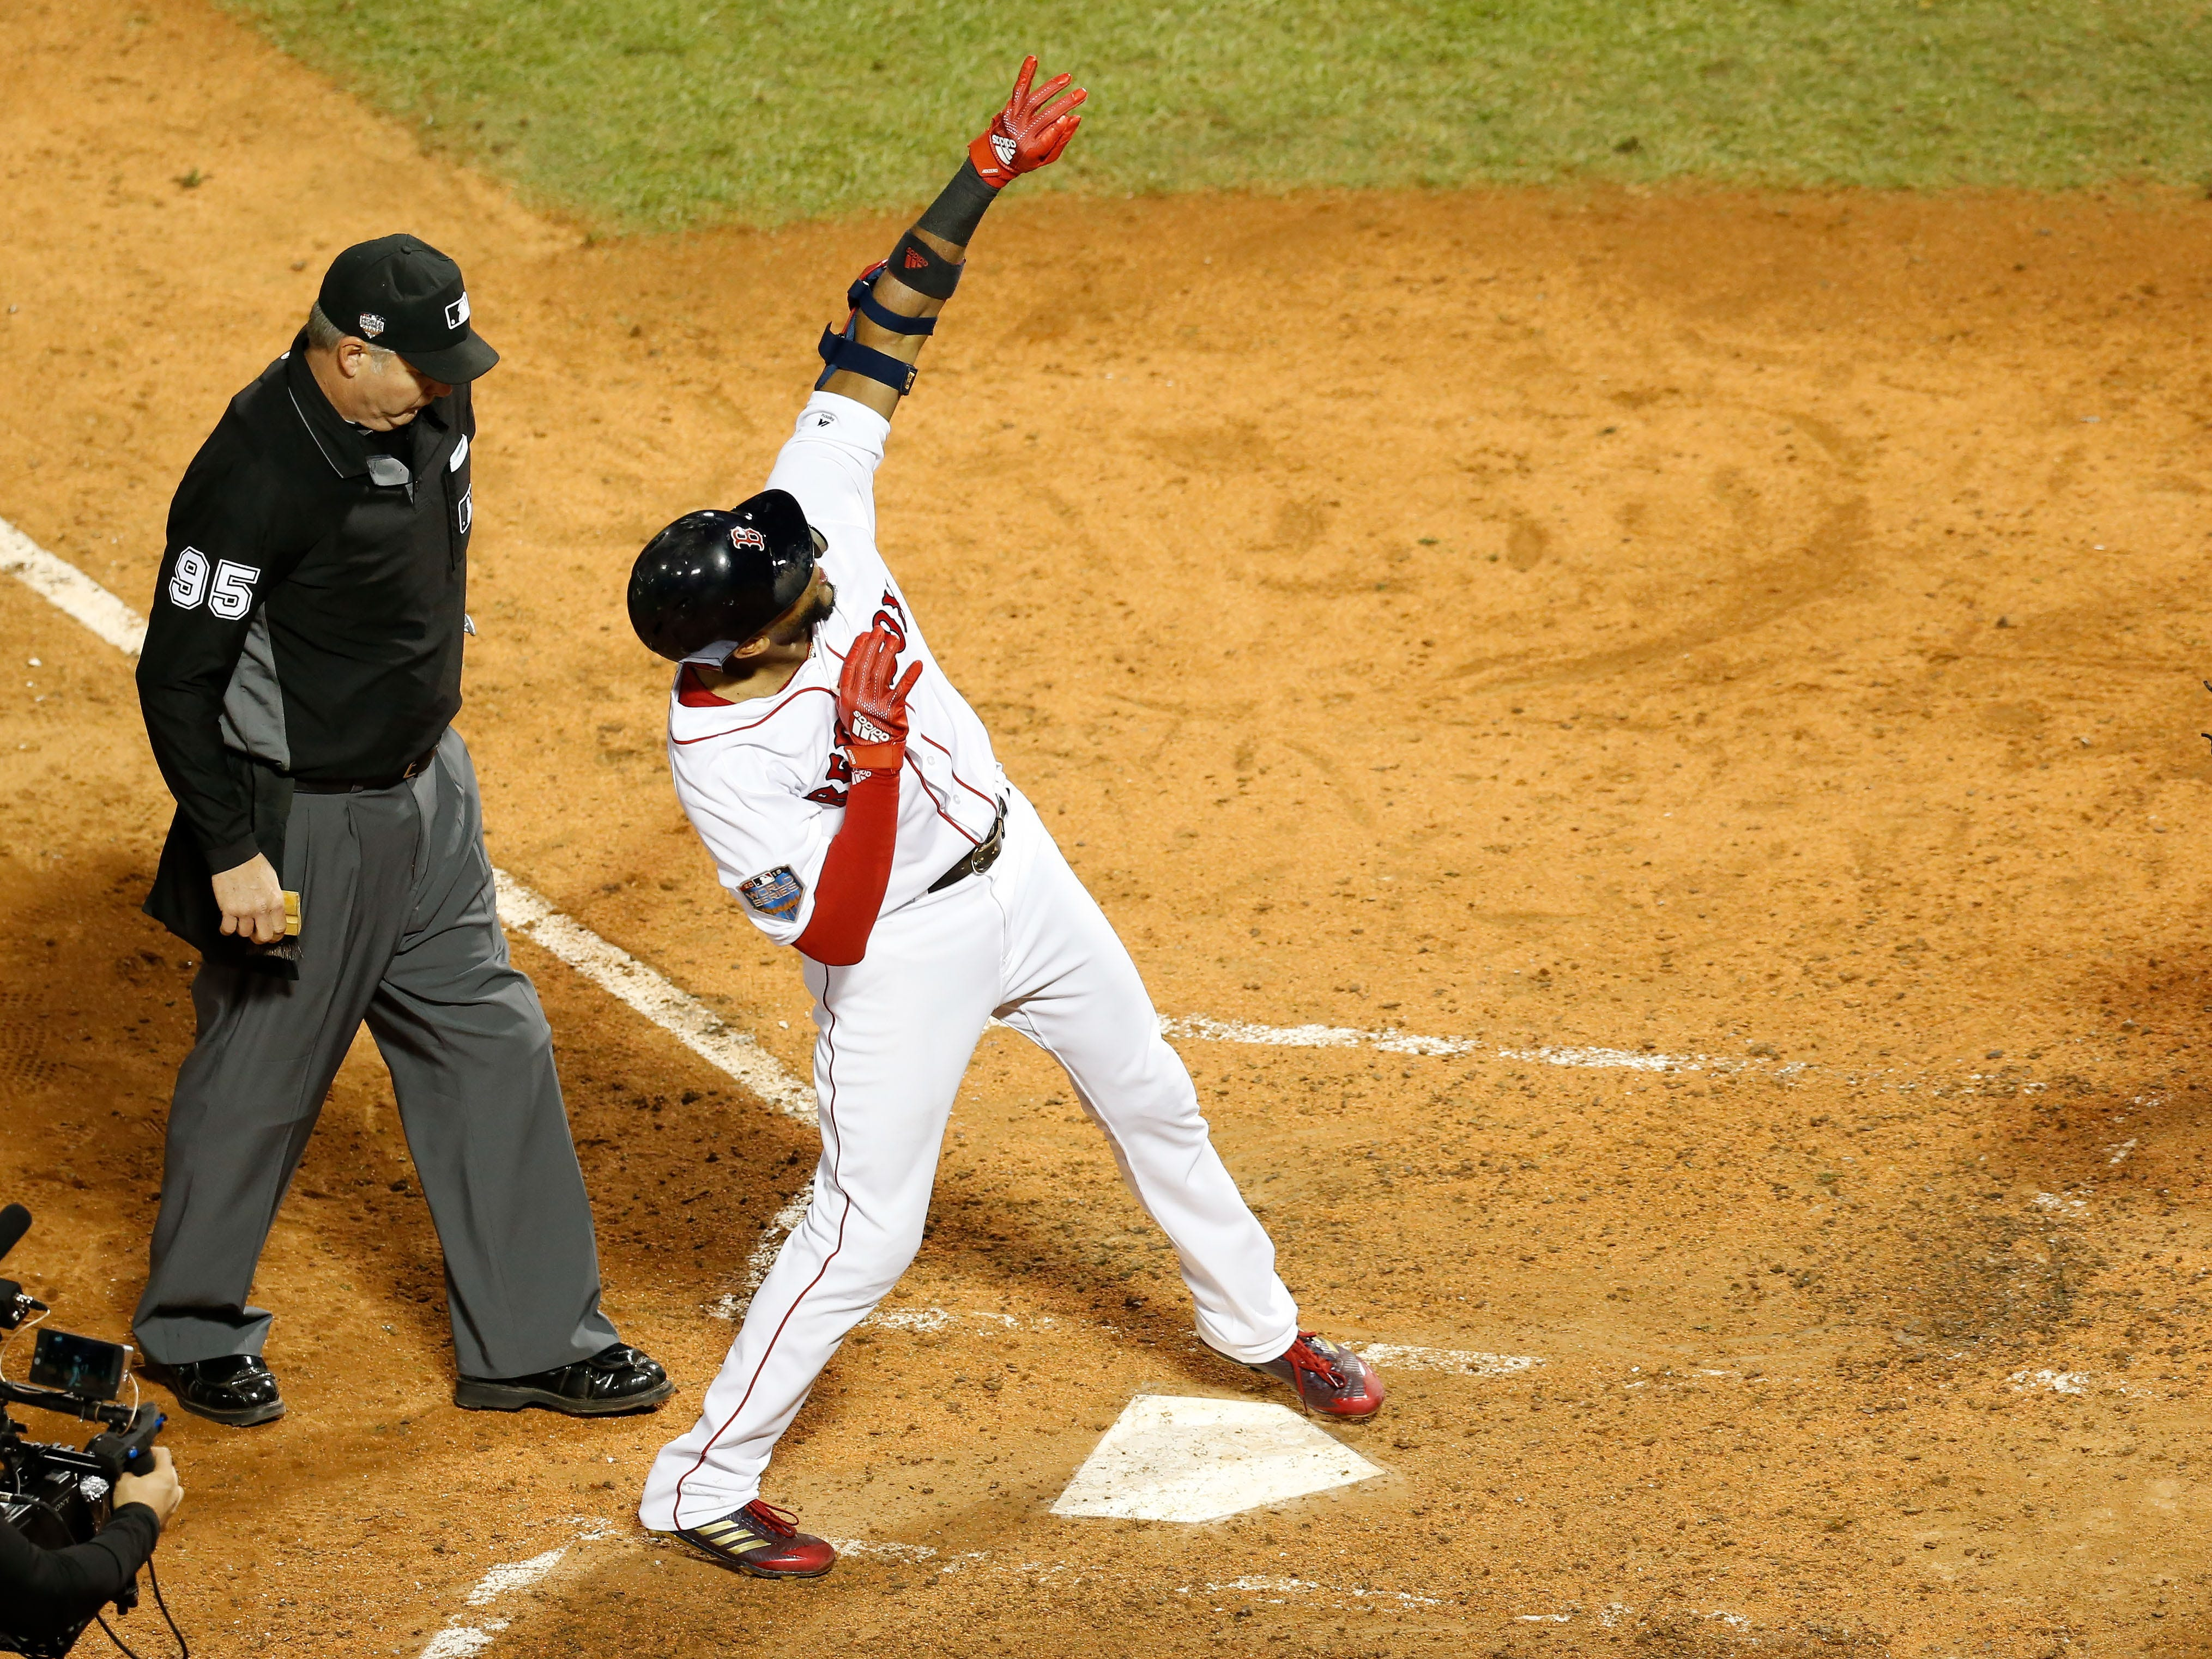 Game 1 at Fenway Park: Eduardo Nunez celebrates his three-run homer in the seventh.